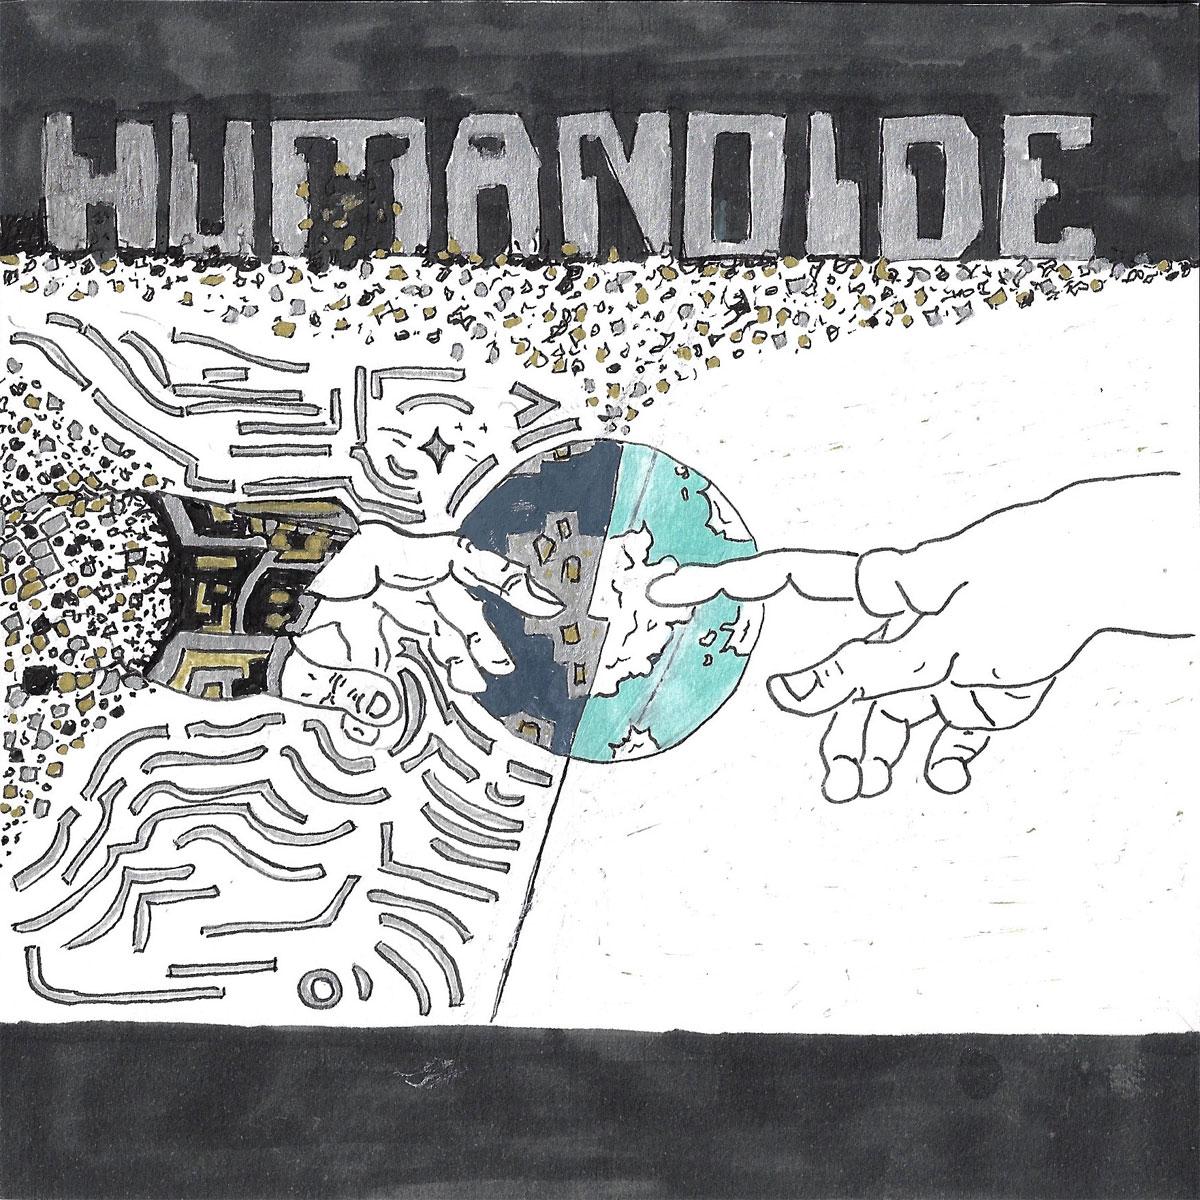 Illustration - 5 - Groupe de musique - Hugo villemonteix-Leroy